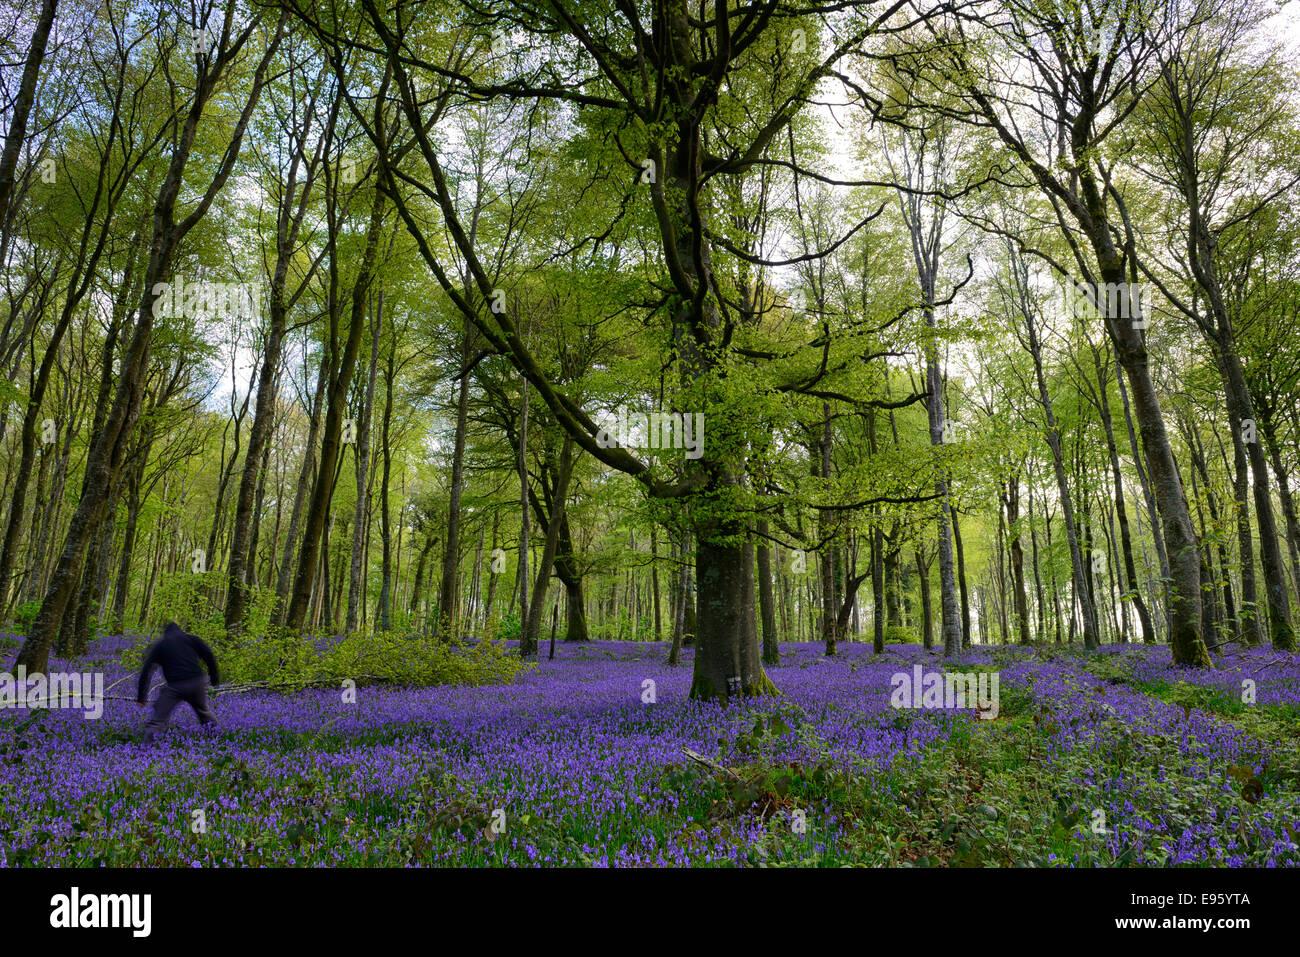 L'homme figure à capuchon bois bluebell menaçant dark woods menace ressort mal Photo Stock